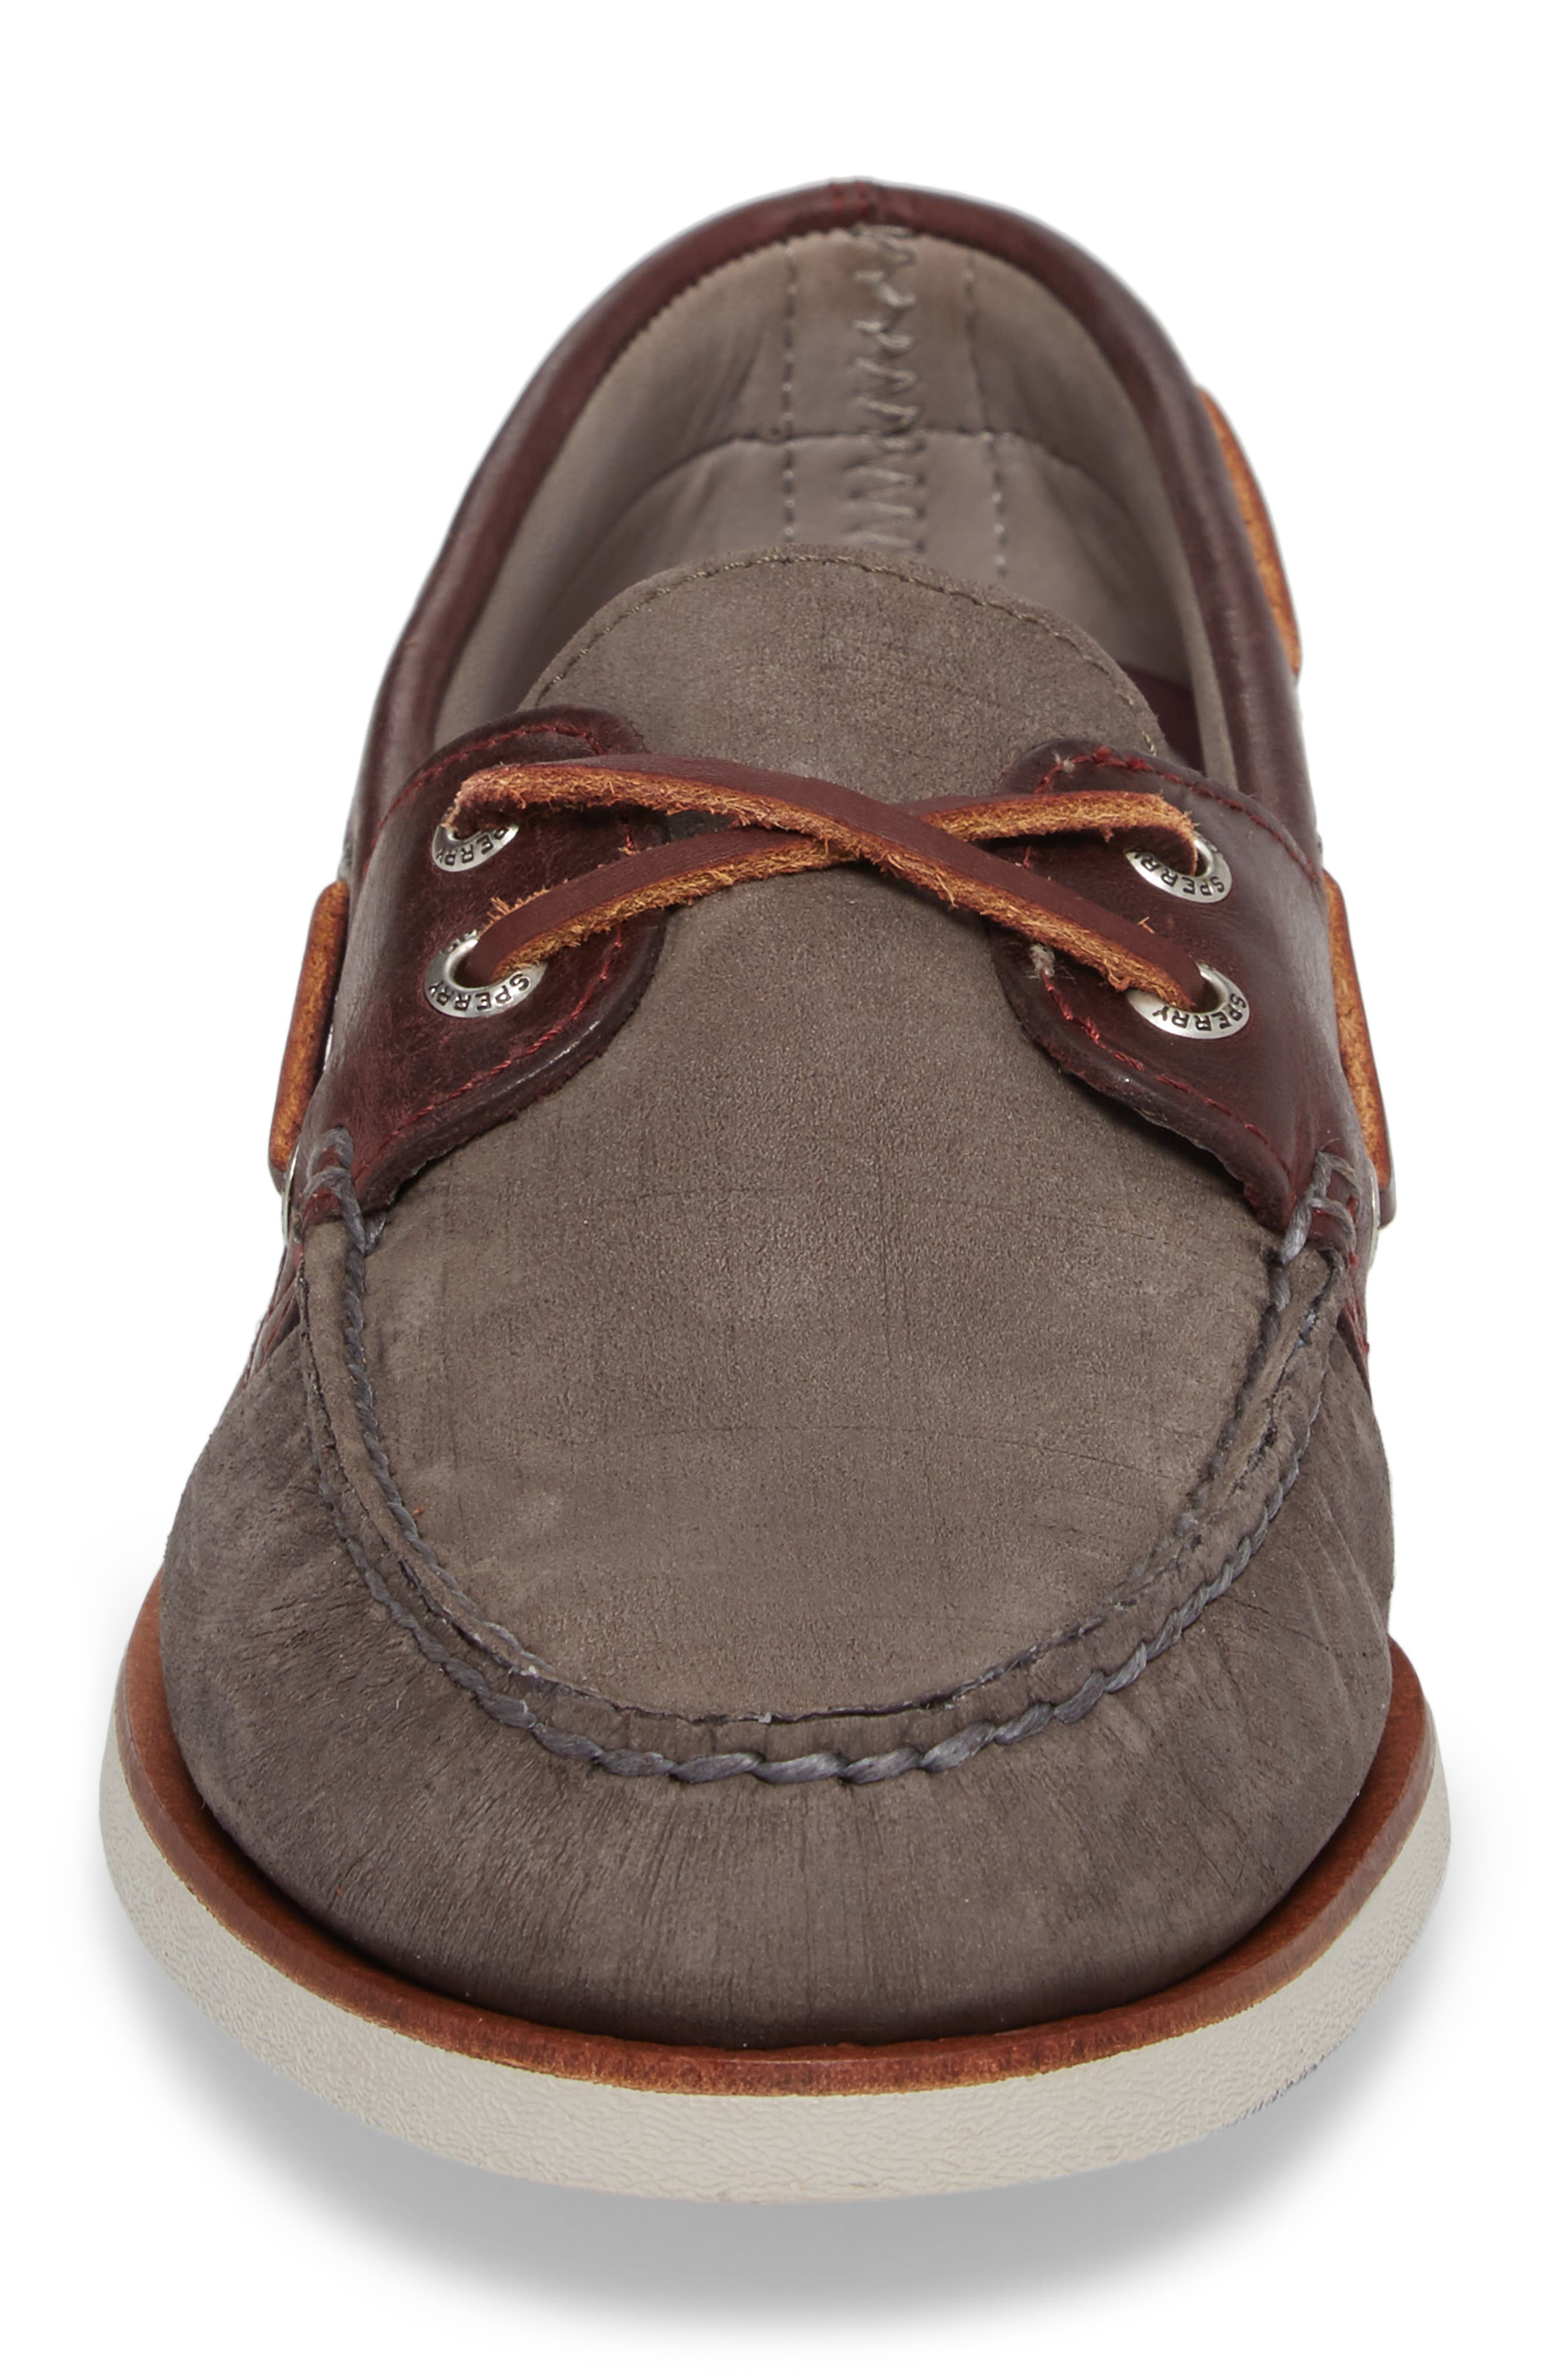 Gold Cup - Authentic Original Boat Shoe,                             Alternate thumbnail 4, color,                             Grey/ Burgundy Leather Nubuck